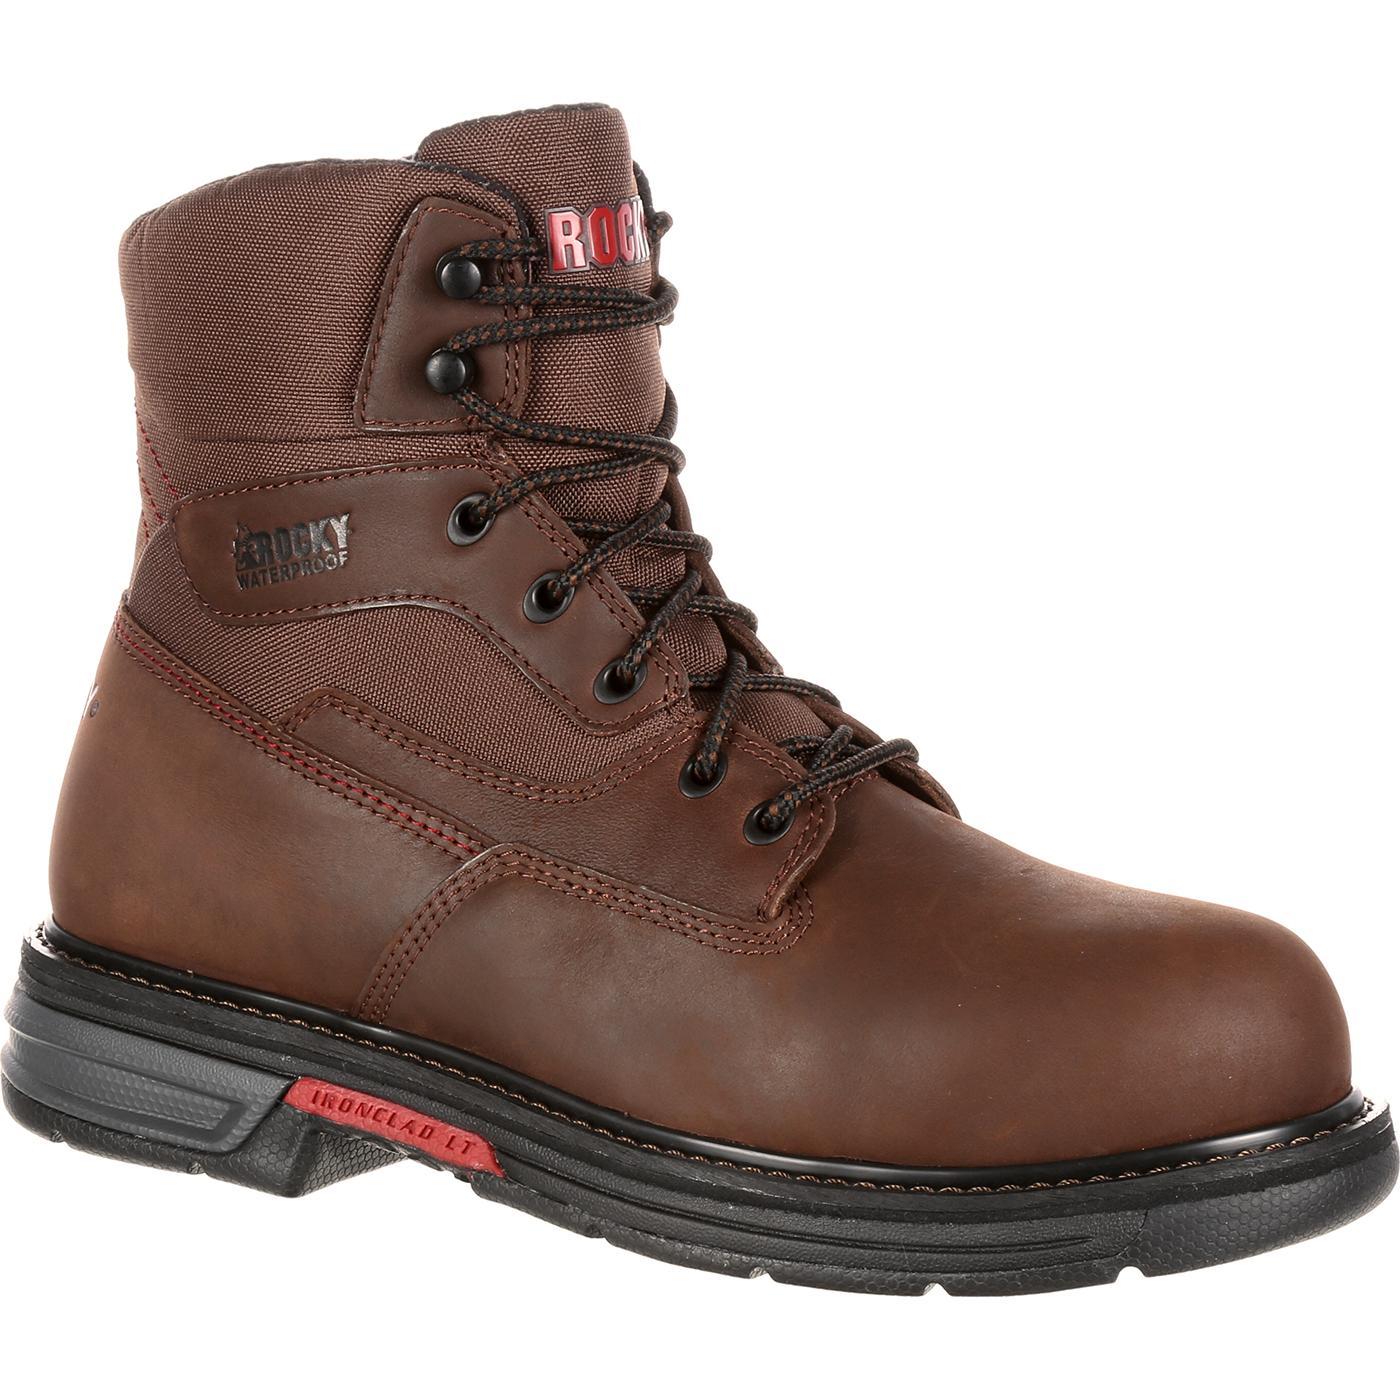 MobiLite Steel Toe Waterproof Work Boot Rocky Boots FQ0006114 w